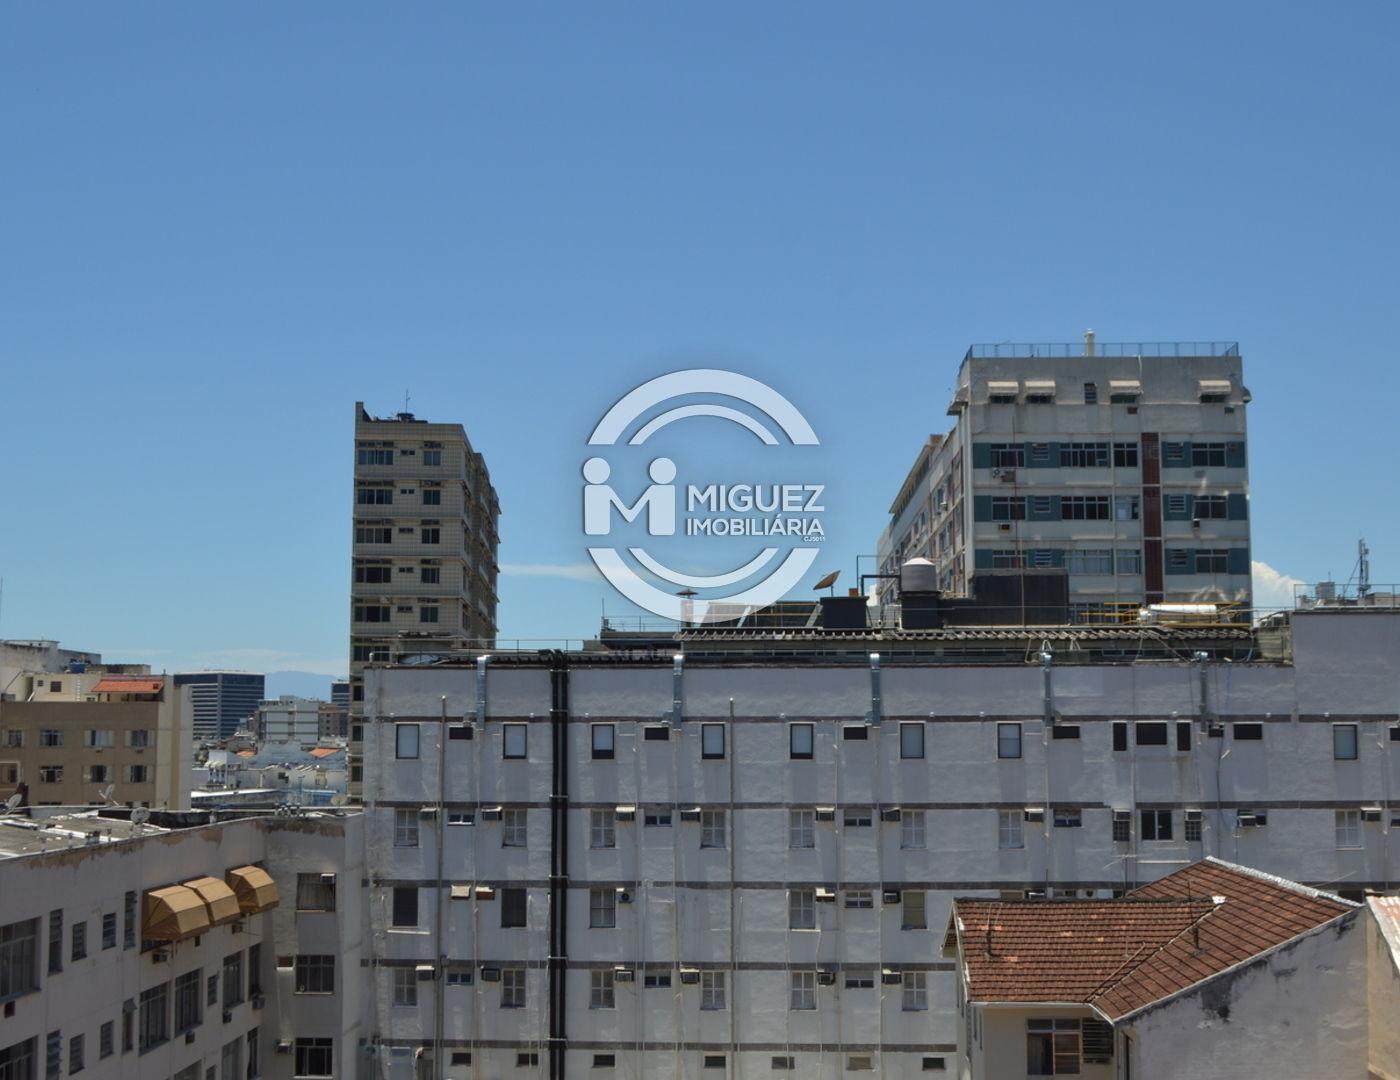 Apartamento, aluguel, Rua Carlos de Vasconcelos - Tijuca , Rio de janeiro